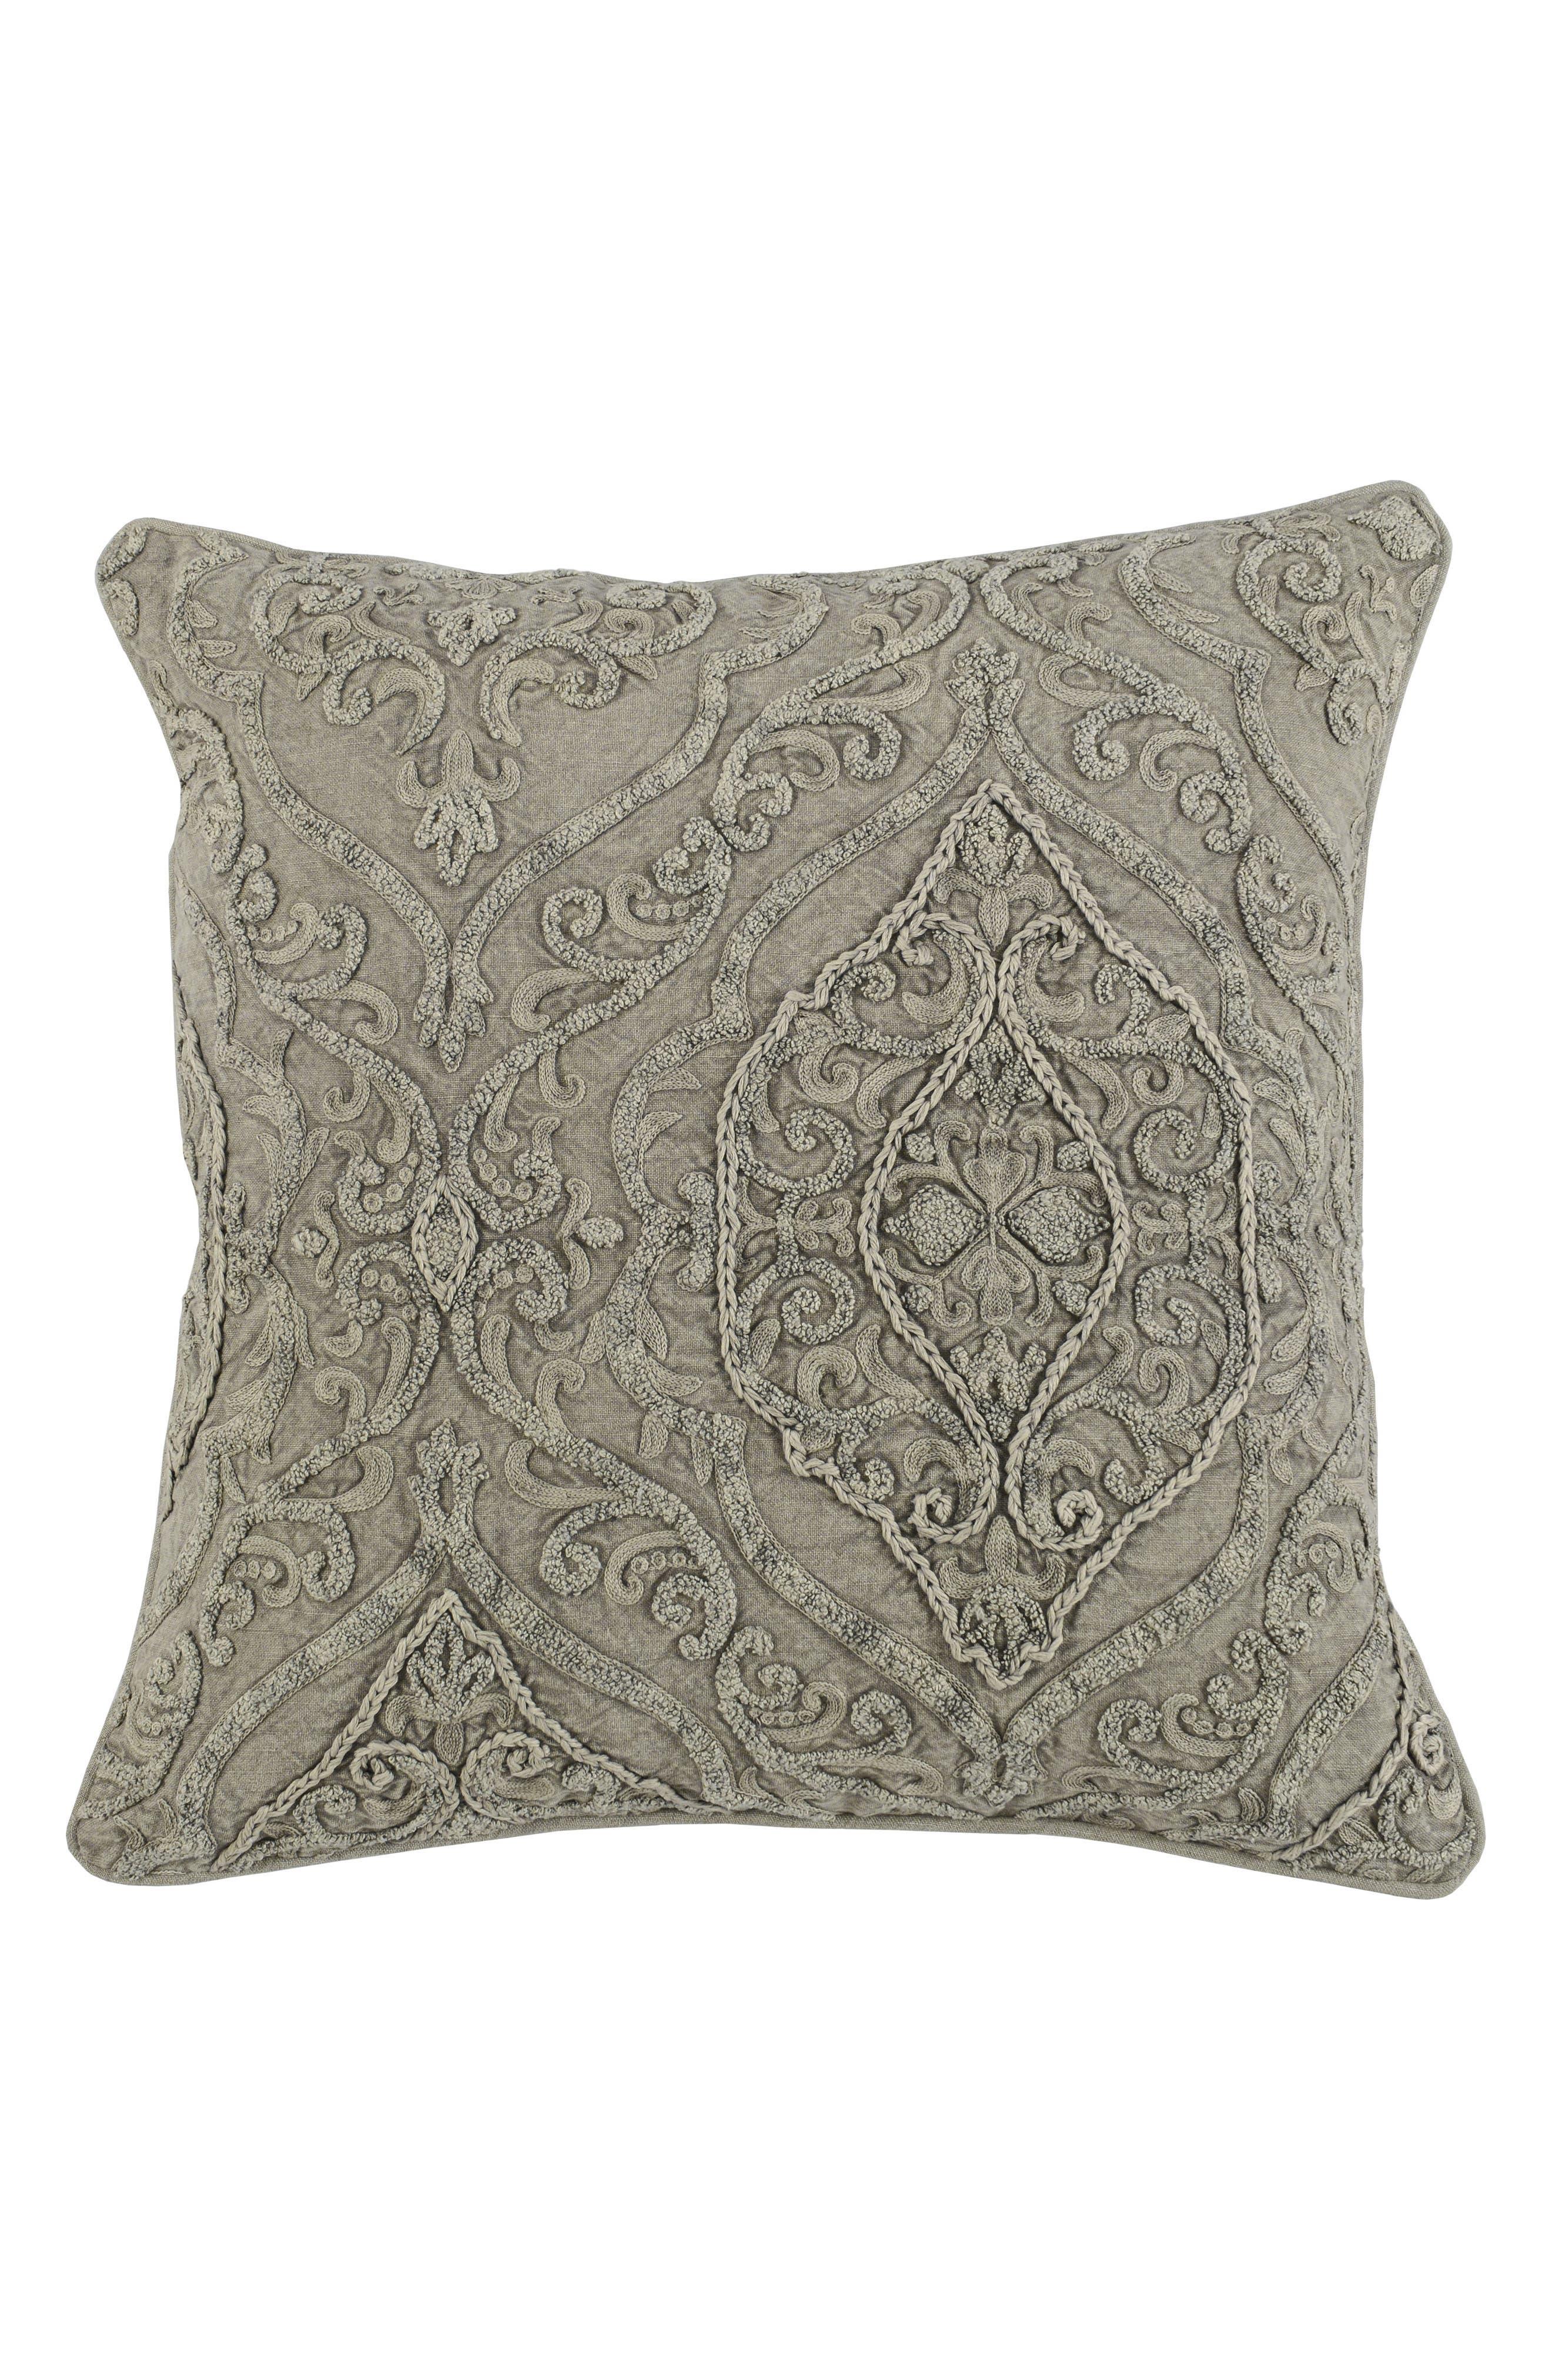 Abilene Accent Pillow,                             Main thumbnail 1, color,                             Natural